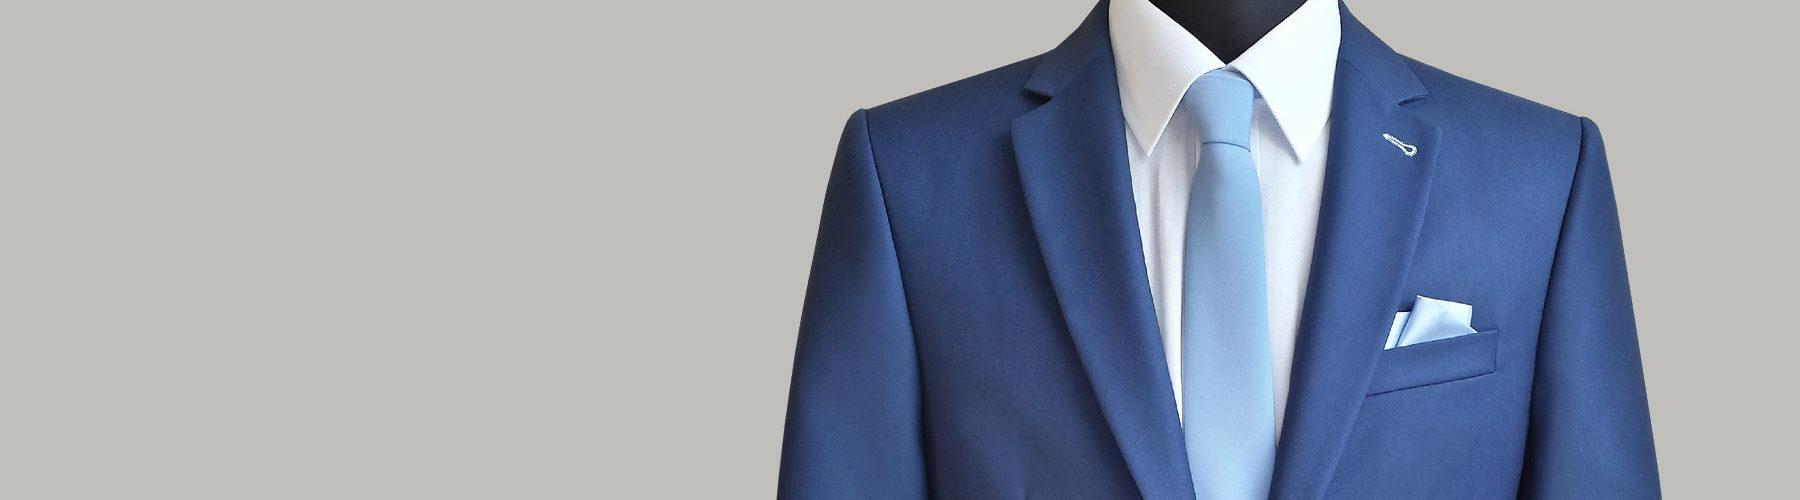 8ecd77980c0e4 Polsmrek – Producent garniturów